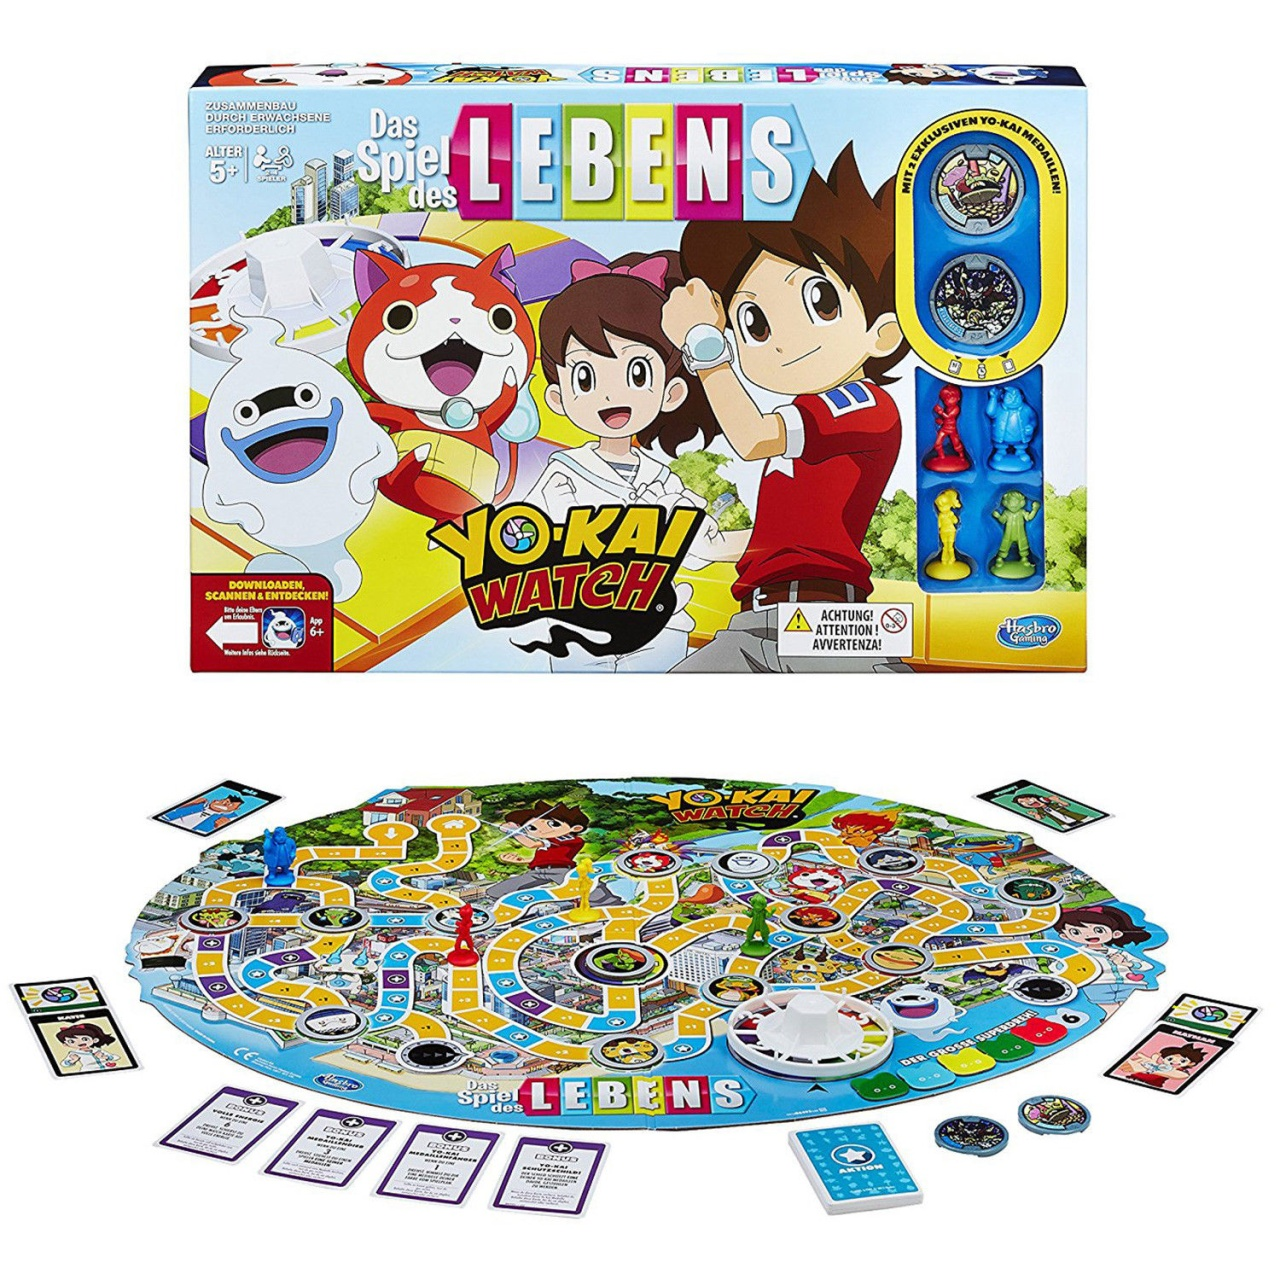 HASBRO Spiel des LebensYO-KAI WATCH -in Box ca 40x27x5,5cm